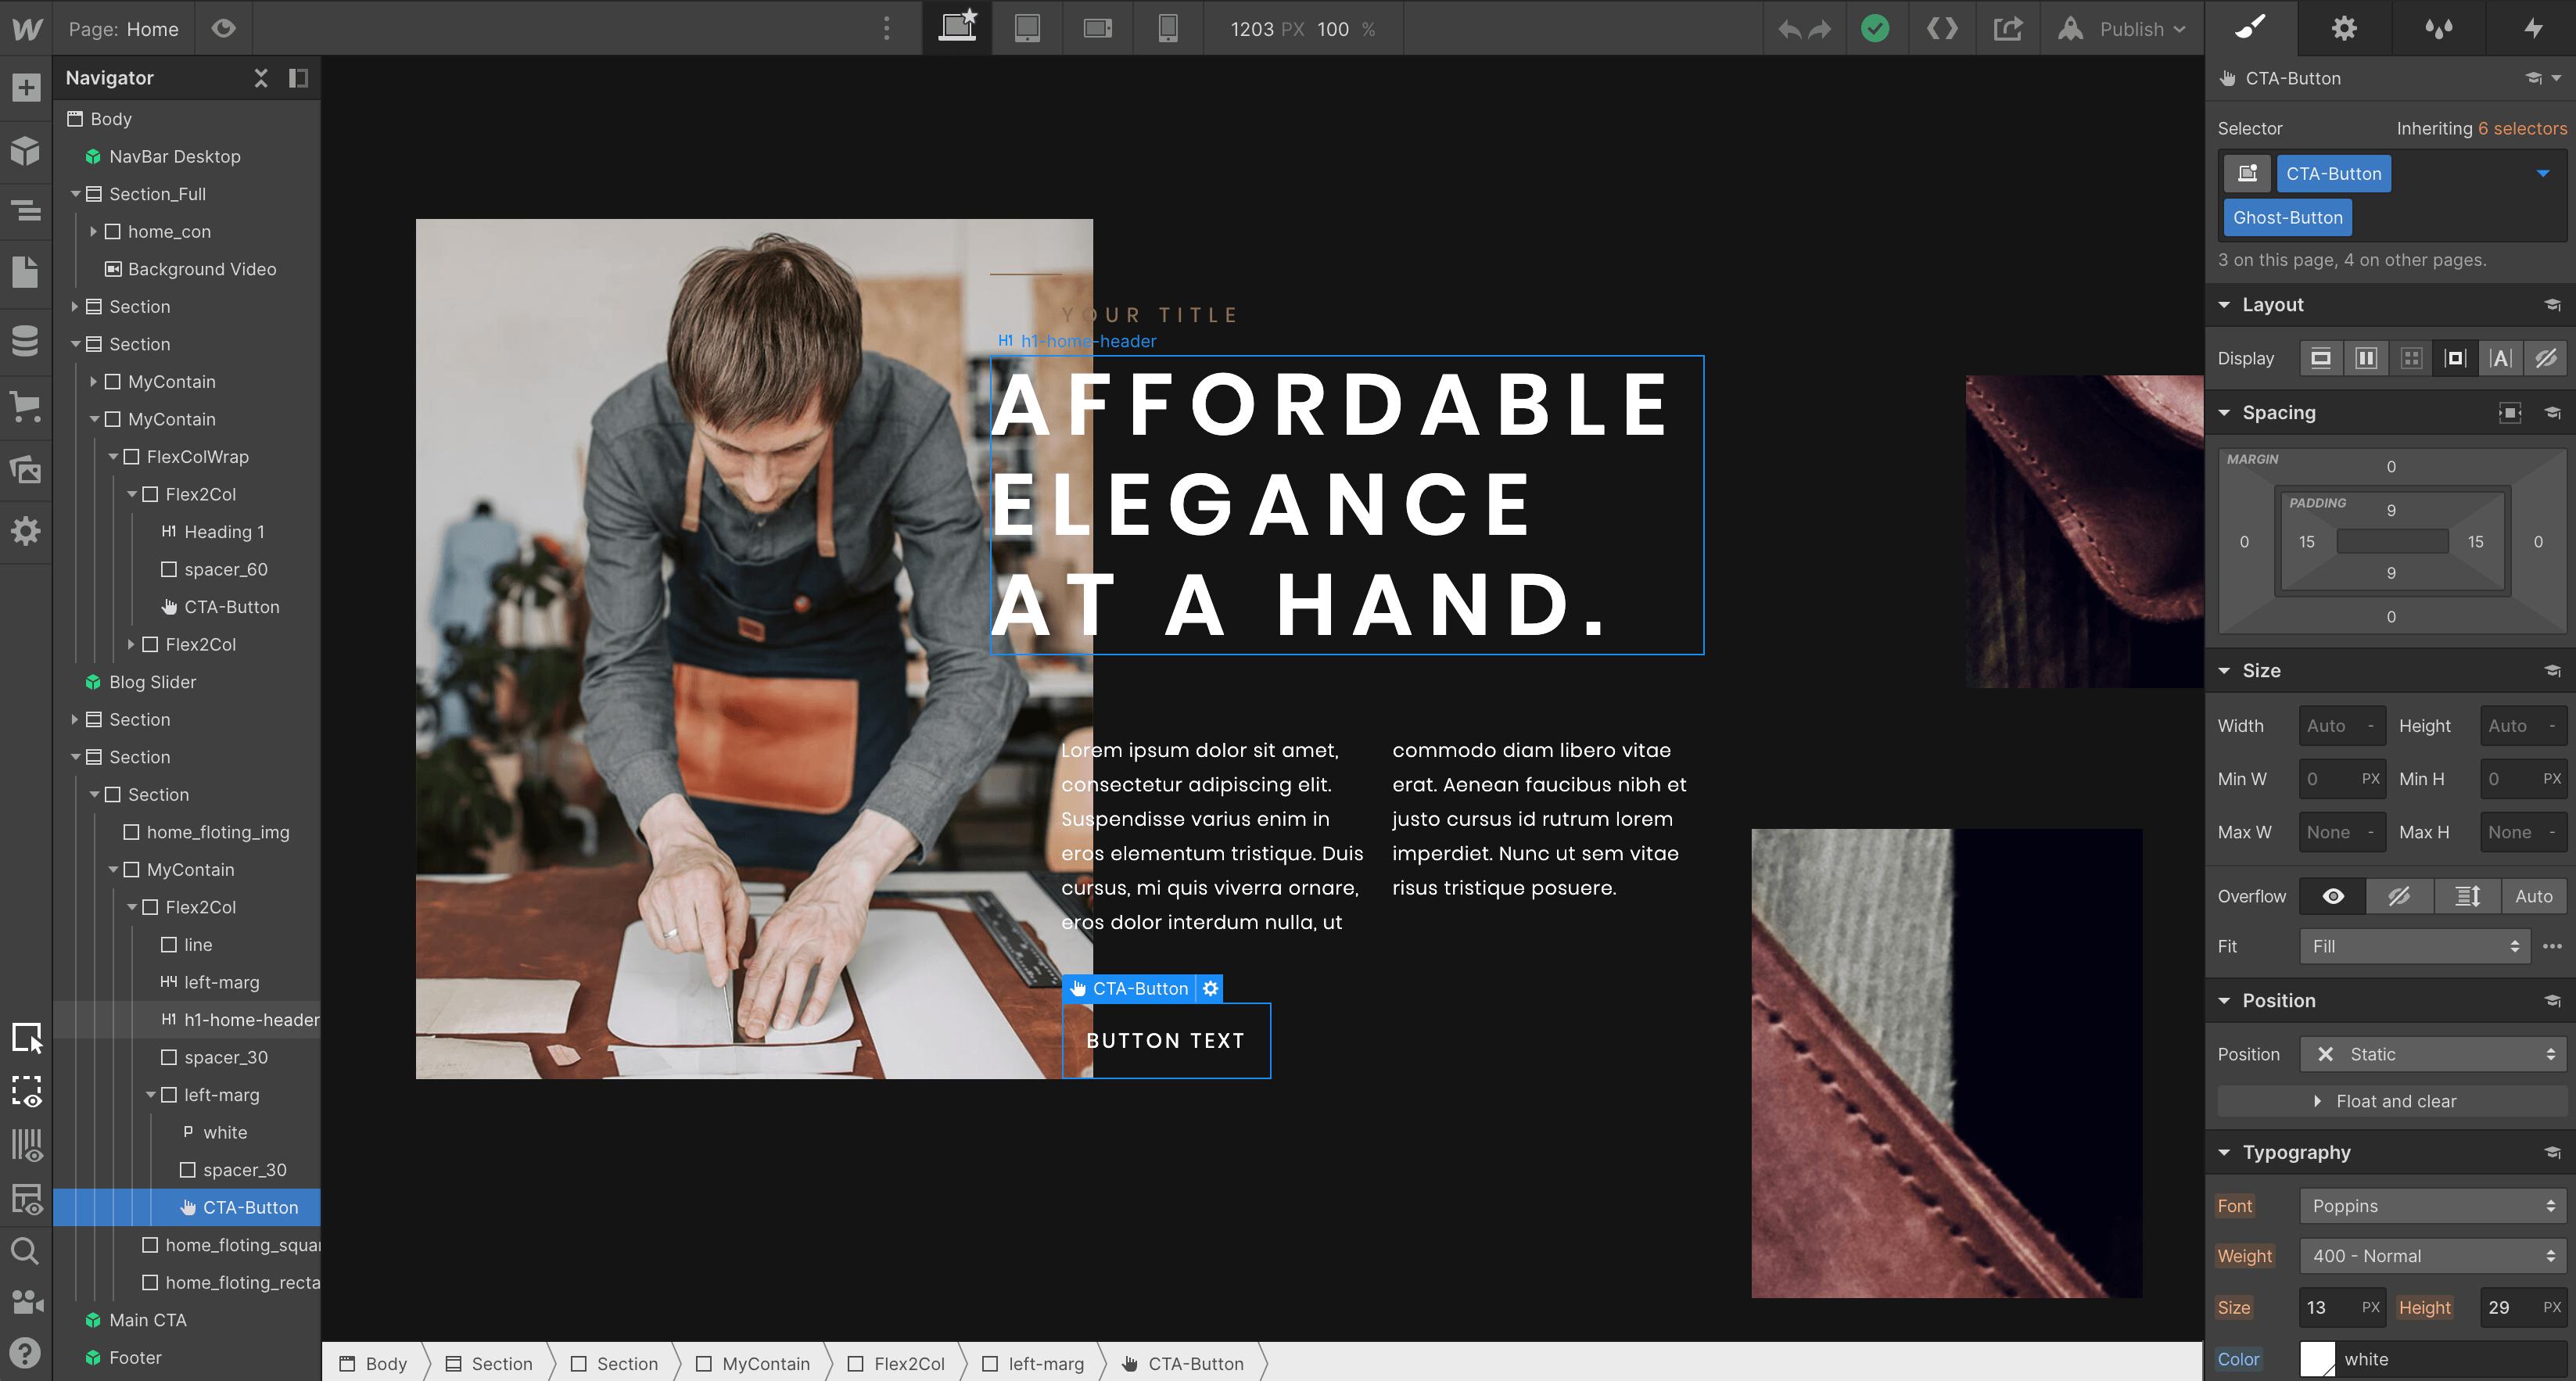 Webflow designer page